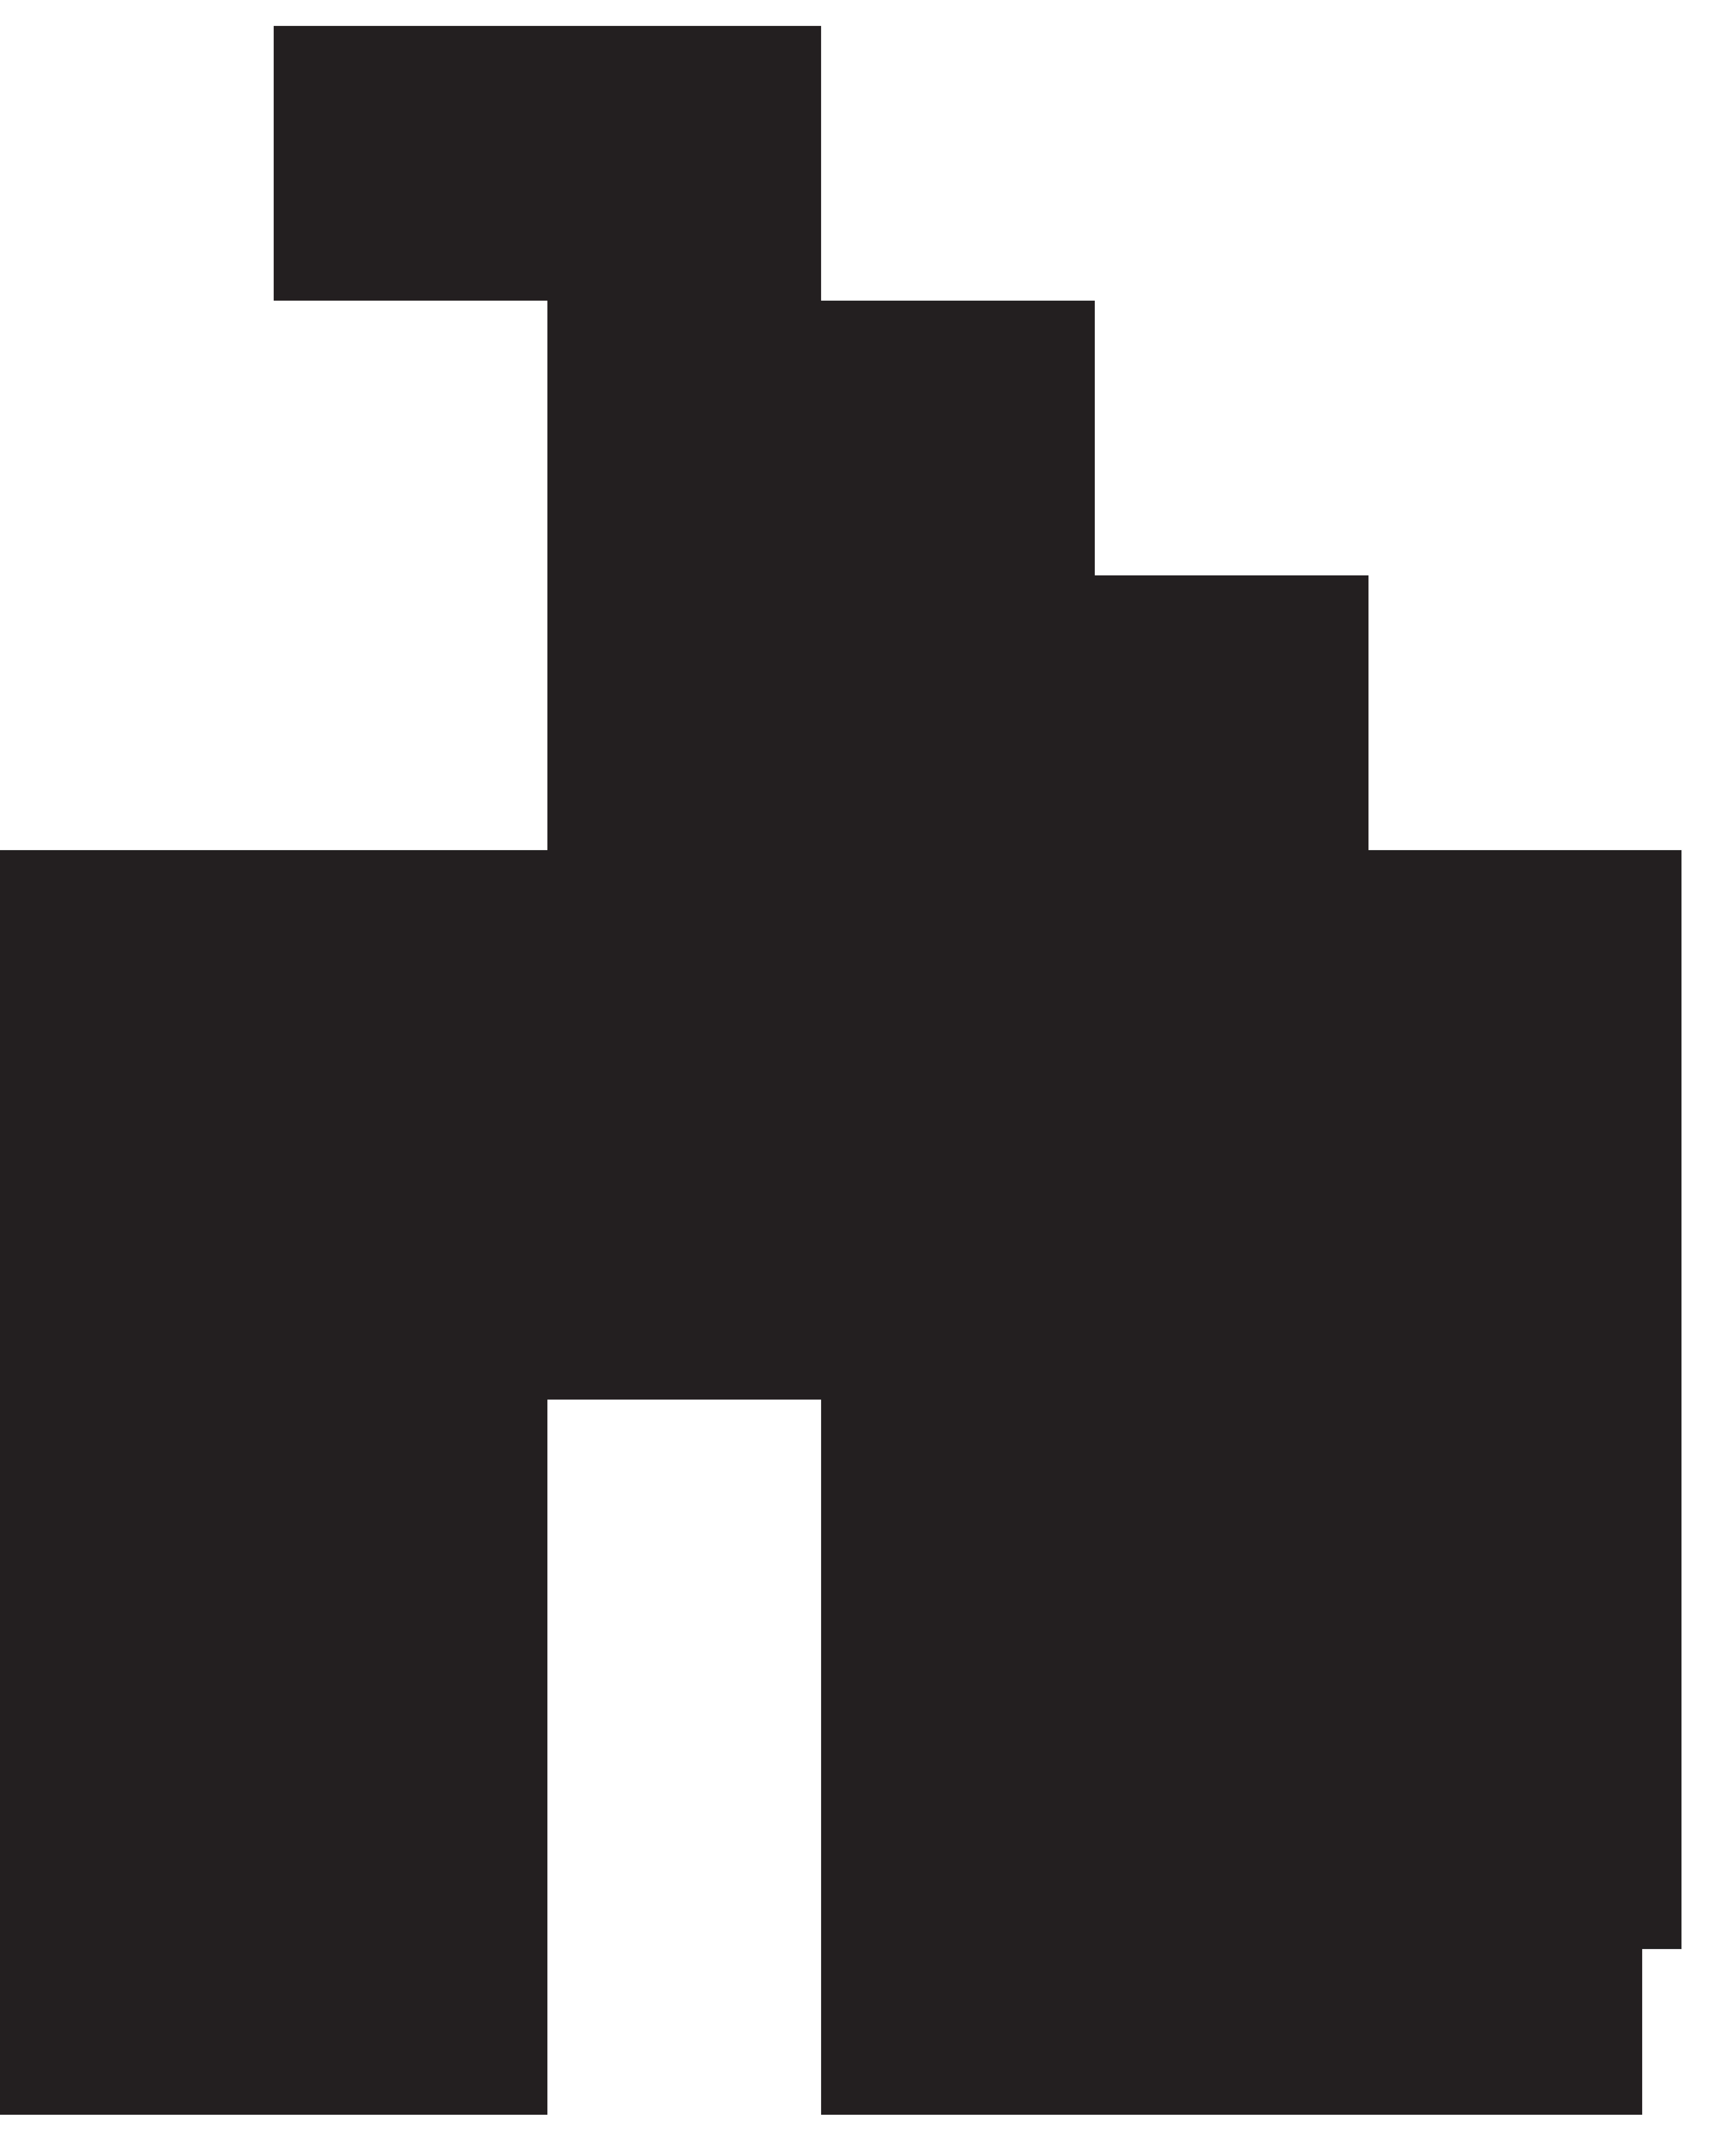 Giraffe Silhouette Animal Mammal Horse.